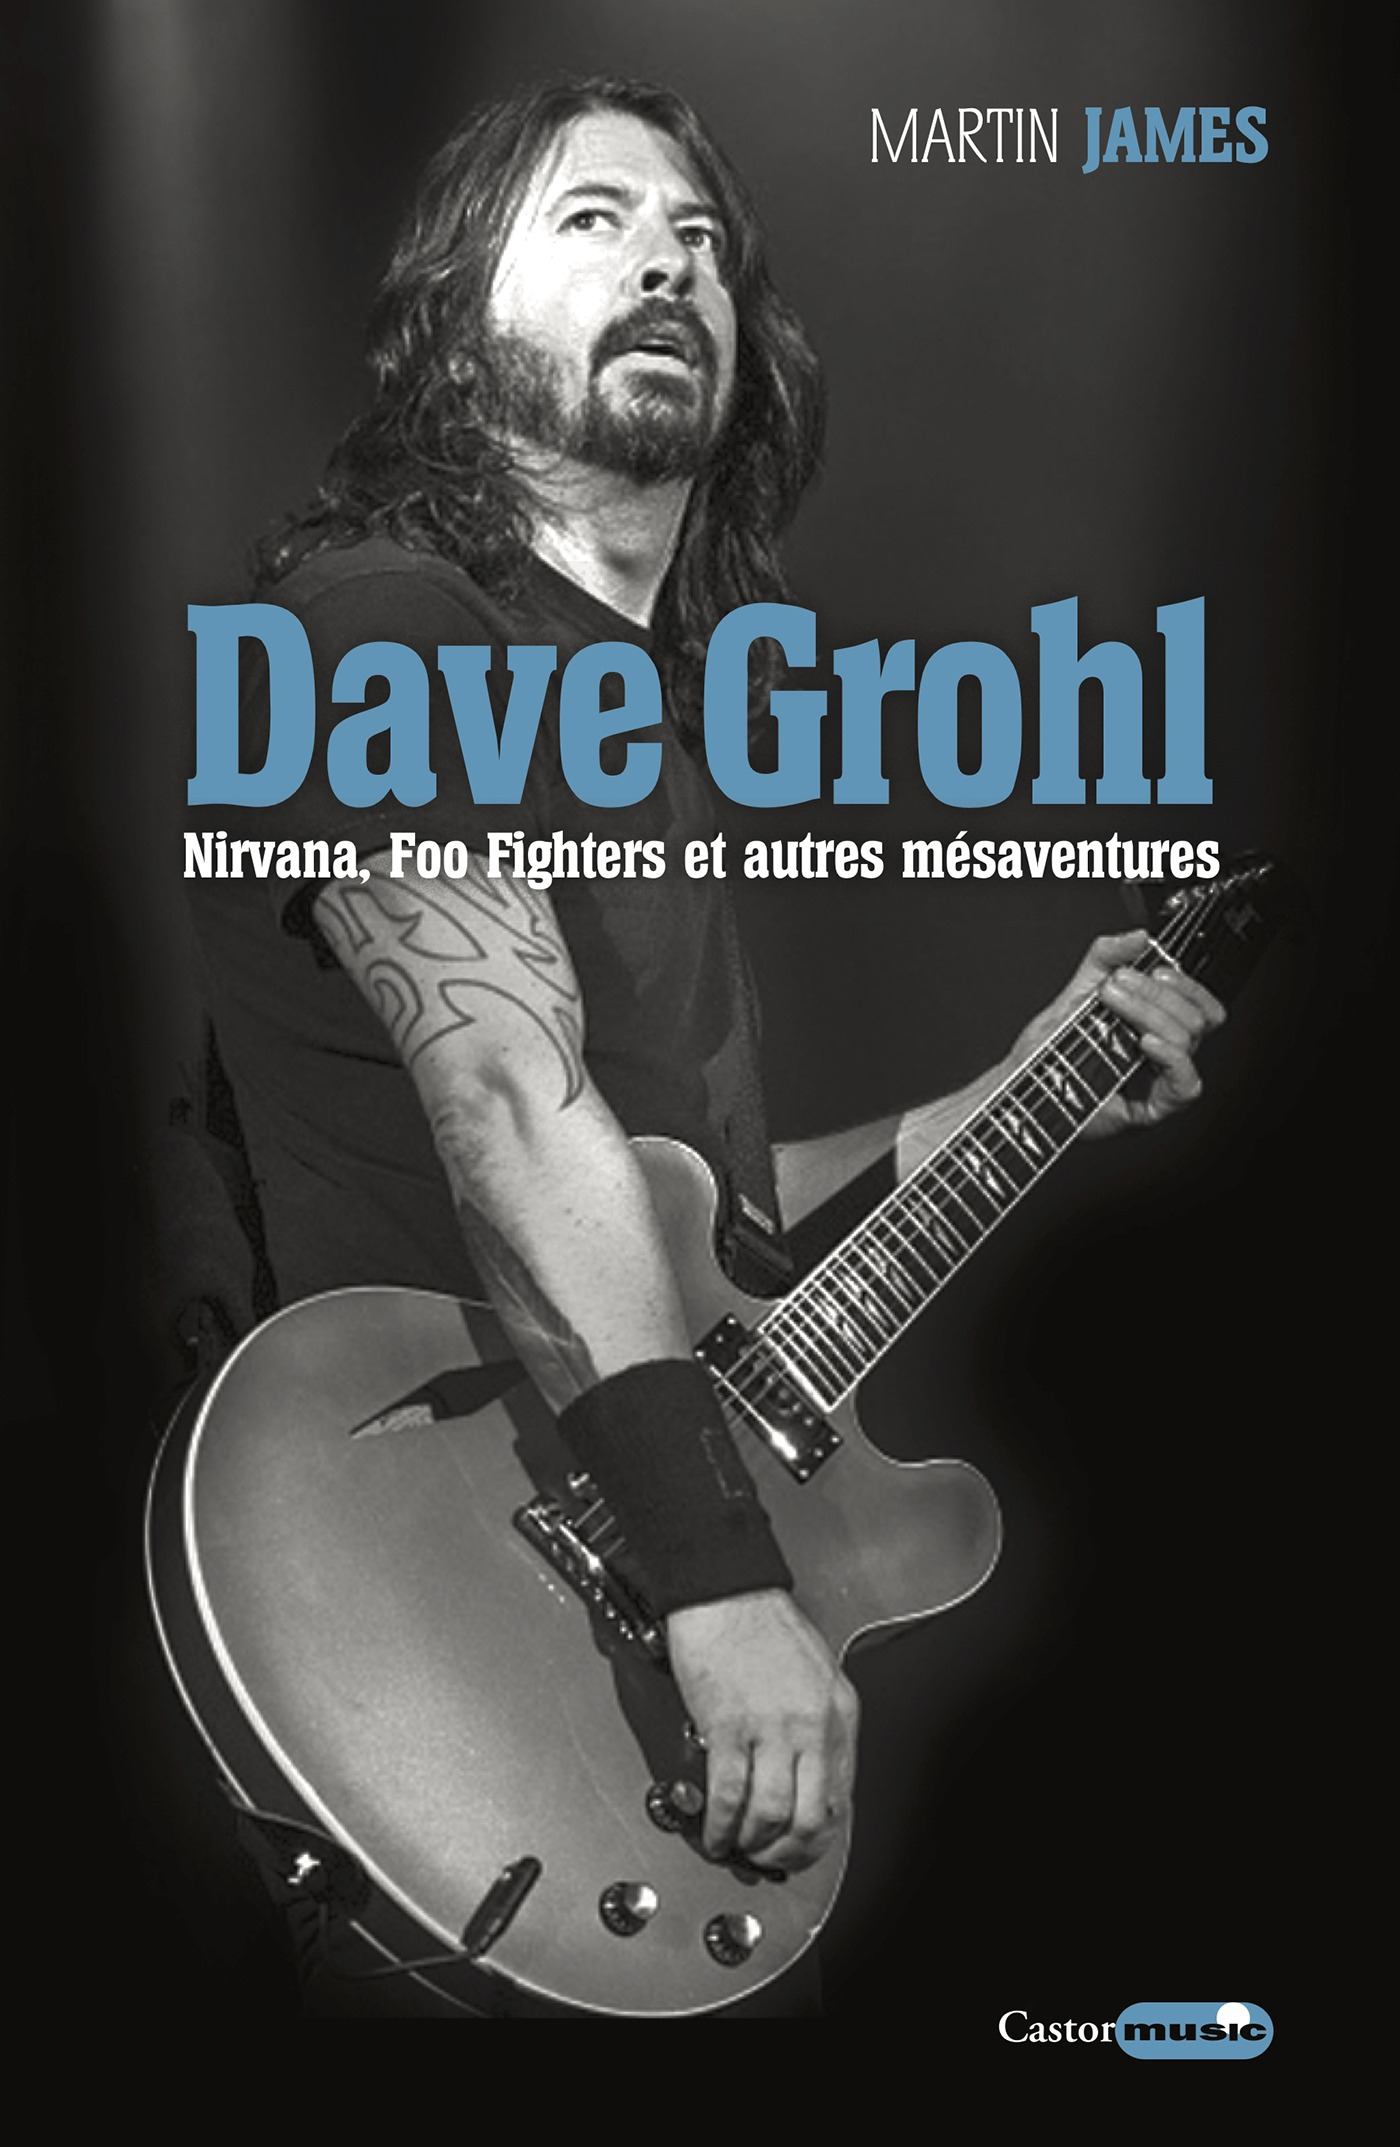 Dave Grohl. Nirvana, Foo Fighters et autres mésaventures